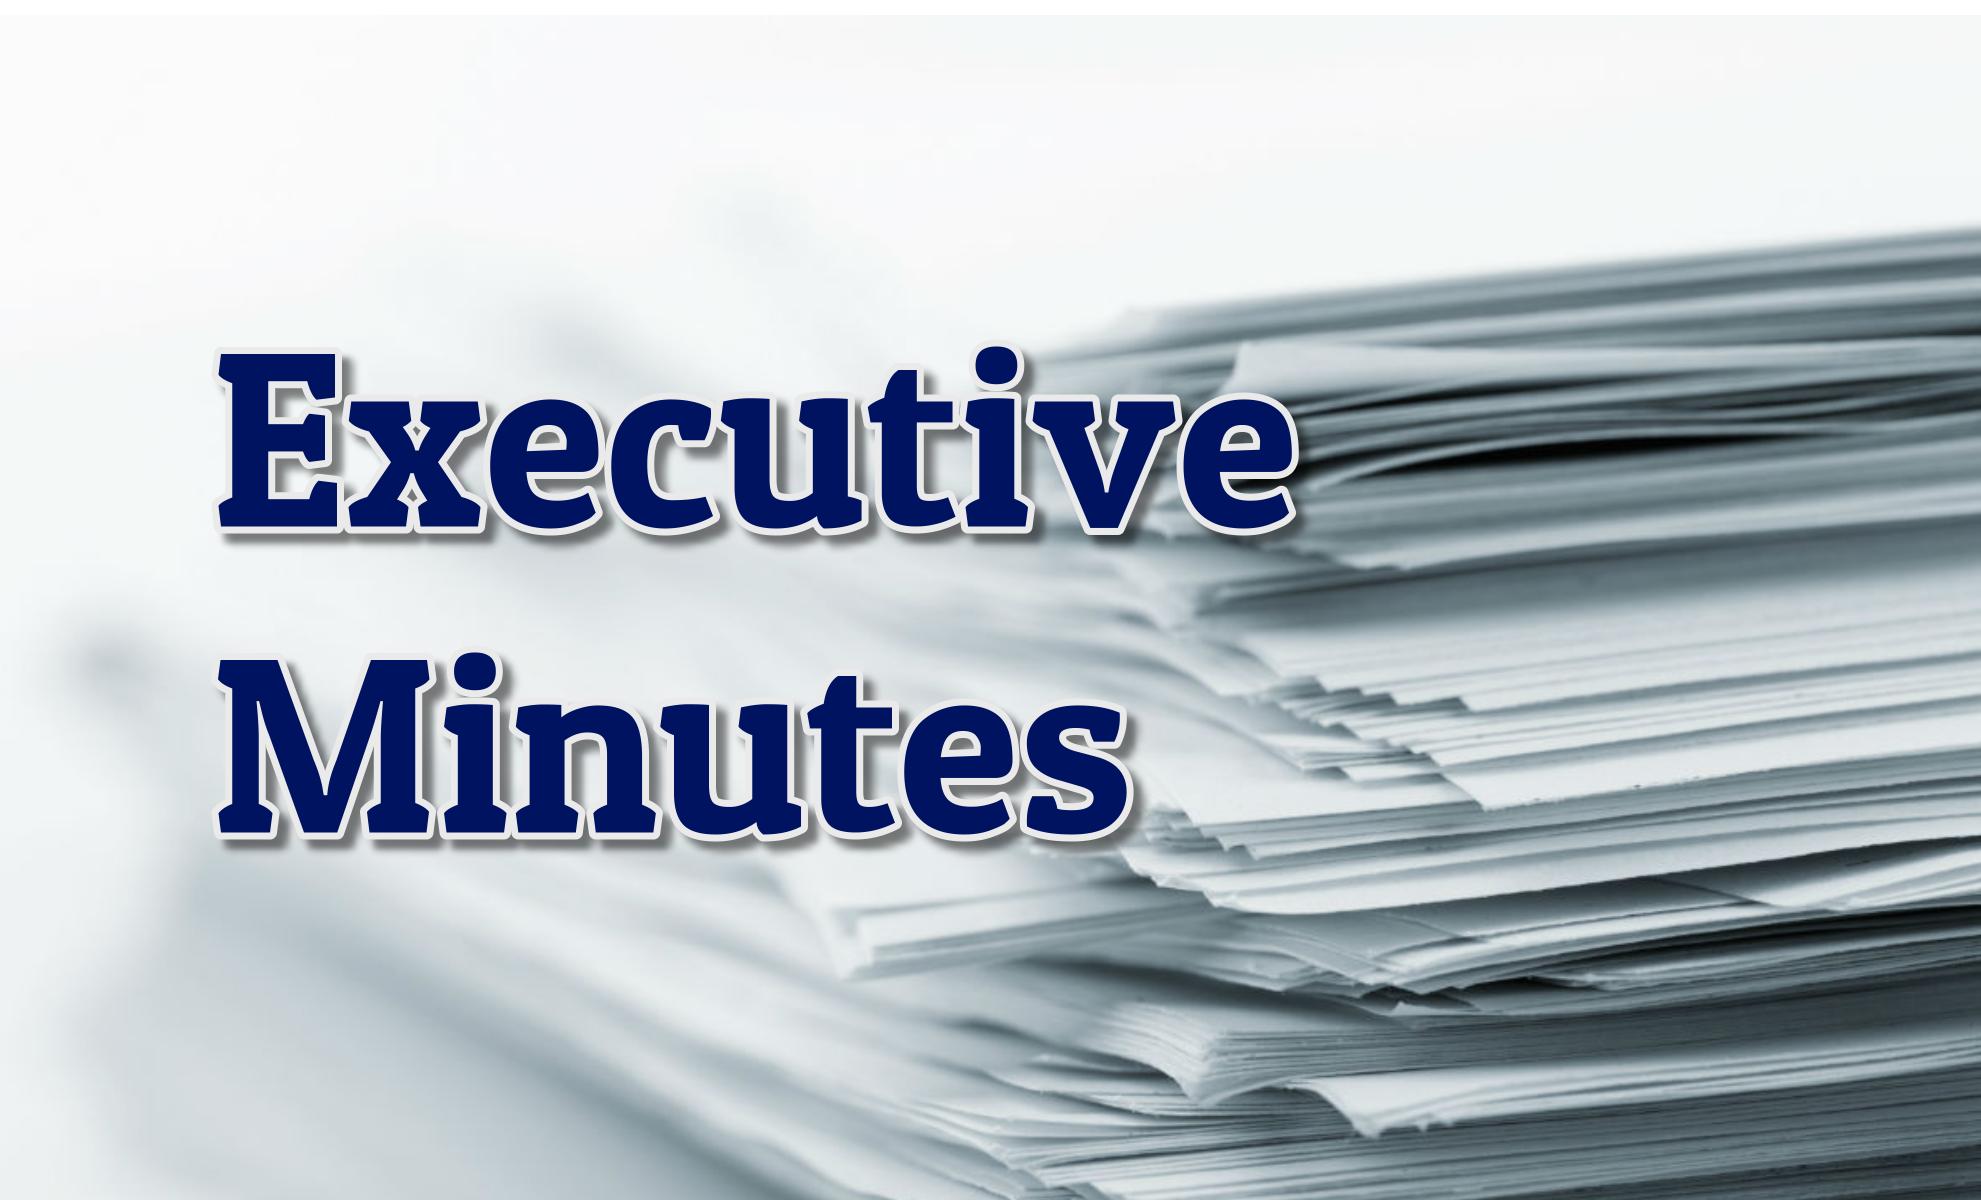 Executive Minutes